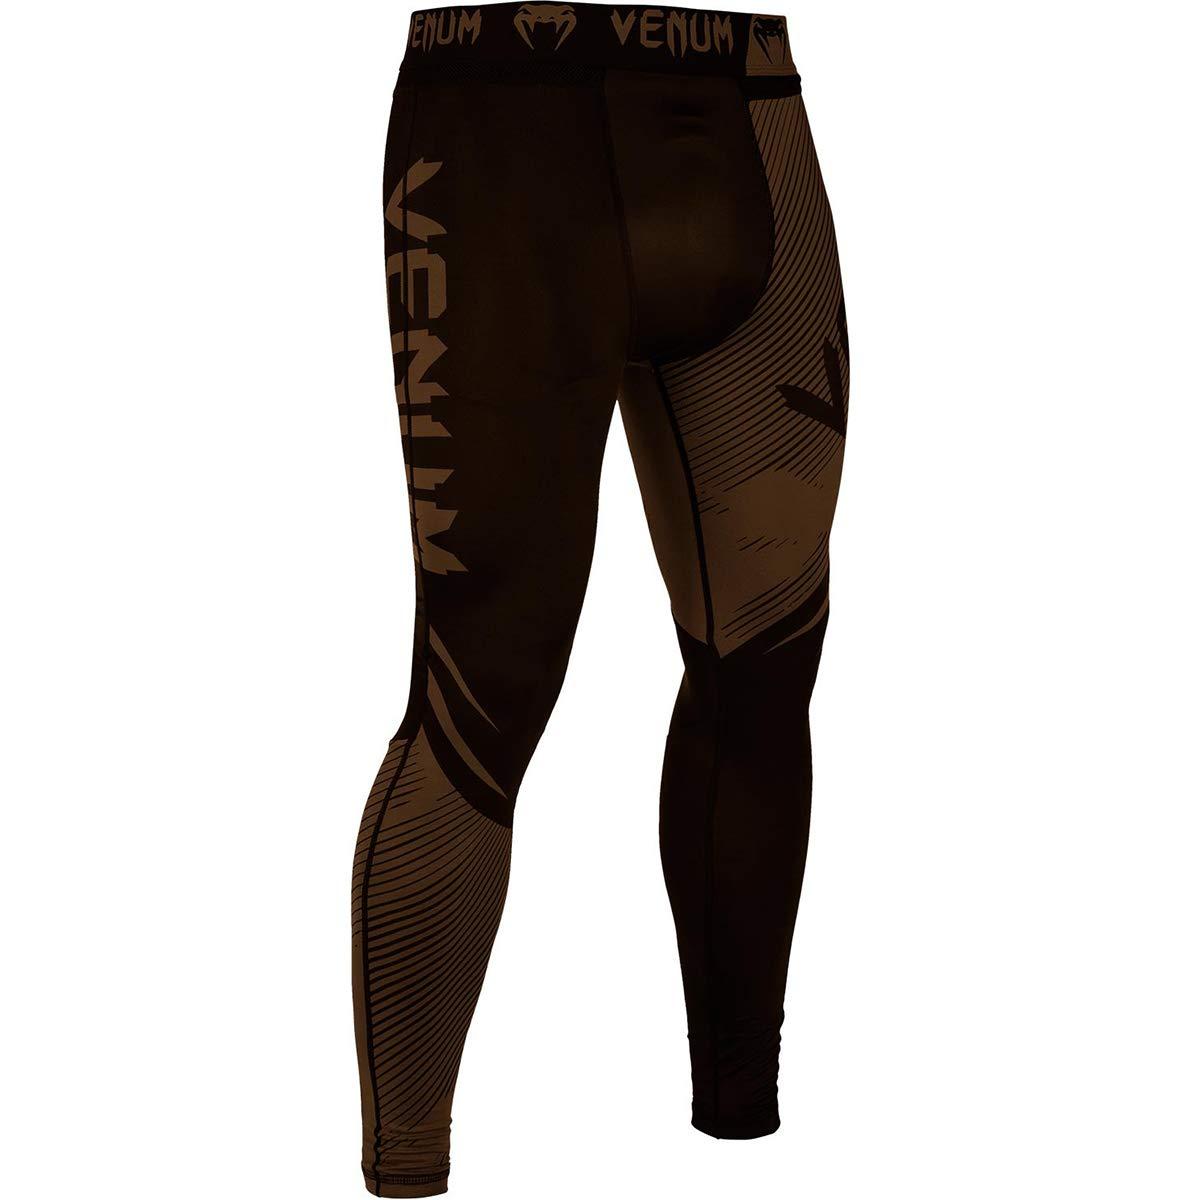 Venum No-Gi 2.0 MMA Compression Spats - XL - Black/Brown by Venum